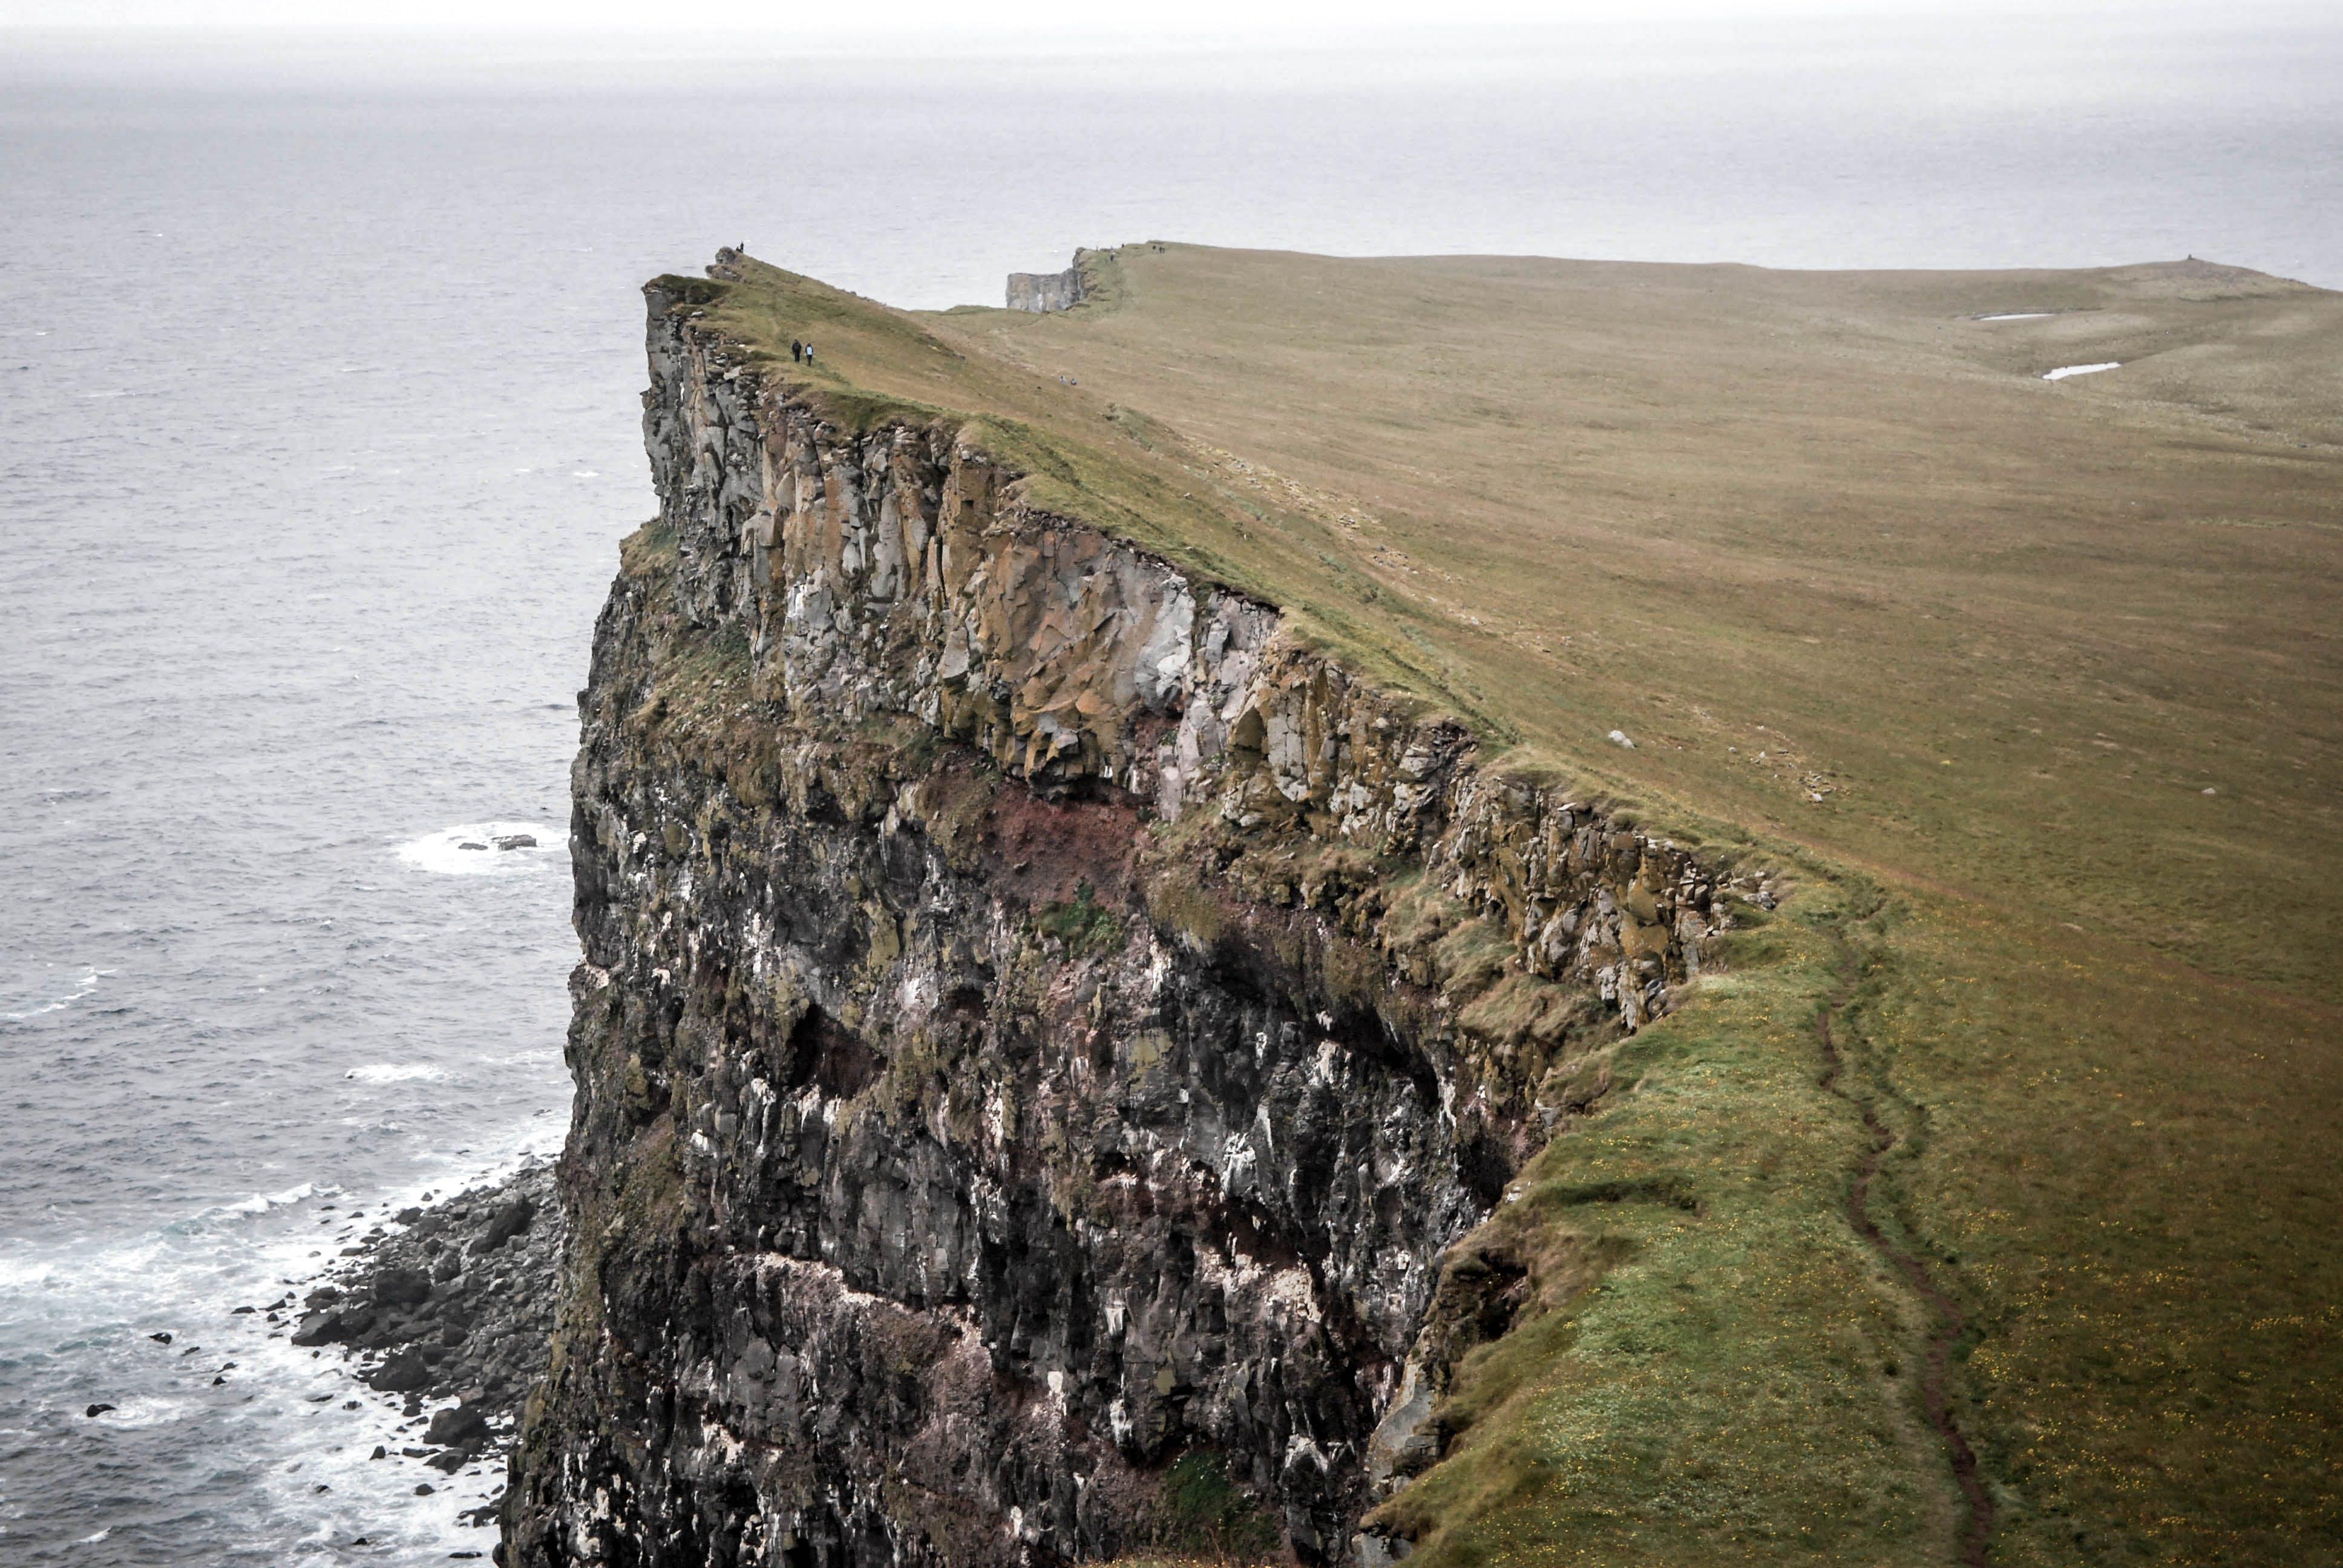 Gray and Green Cliff Near Sea